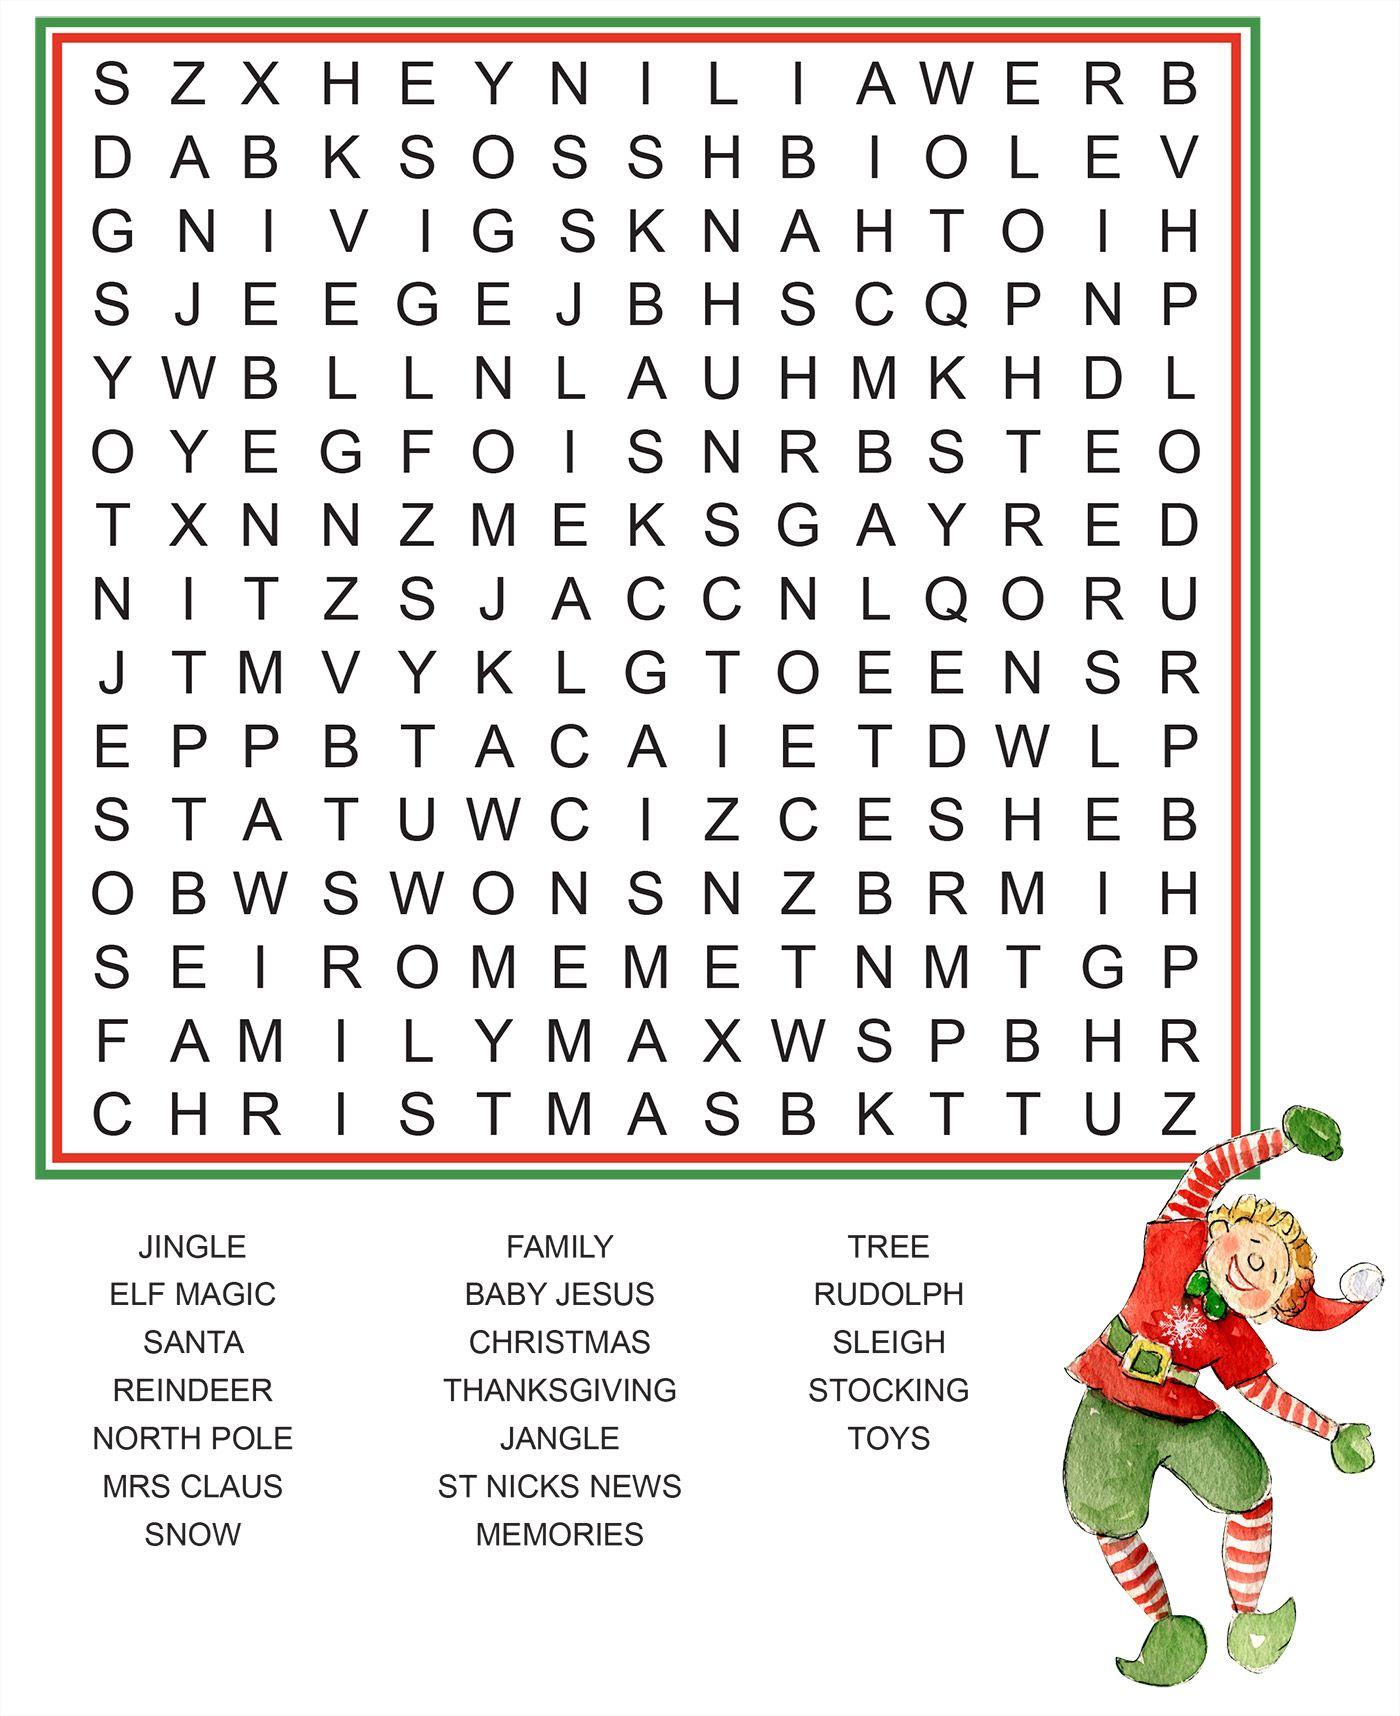 Word Search - Elf Ideas From The Elf Magic Elves | Elf Magic